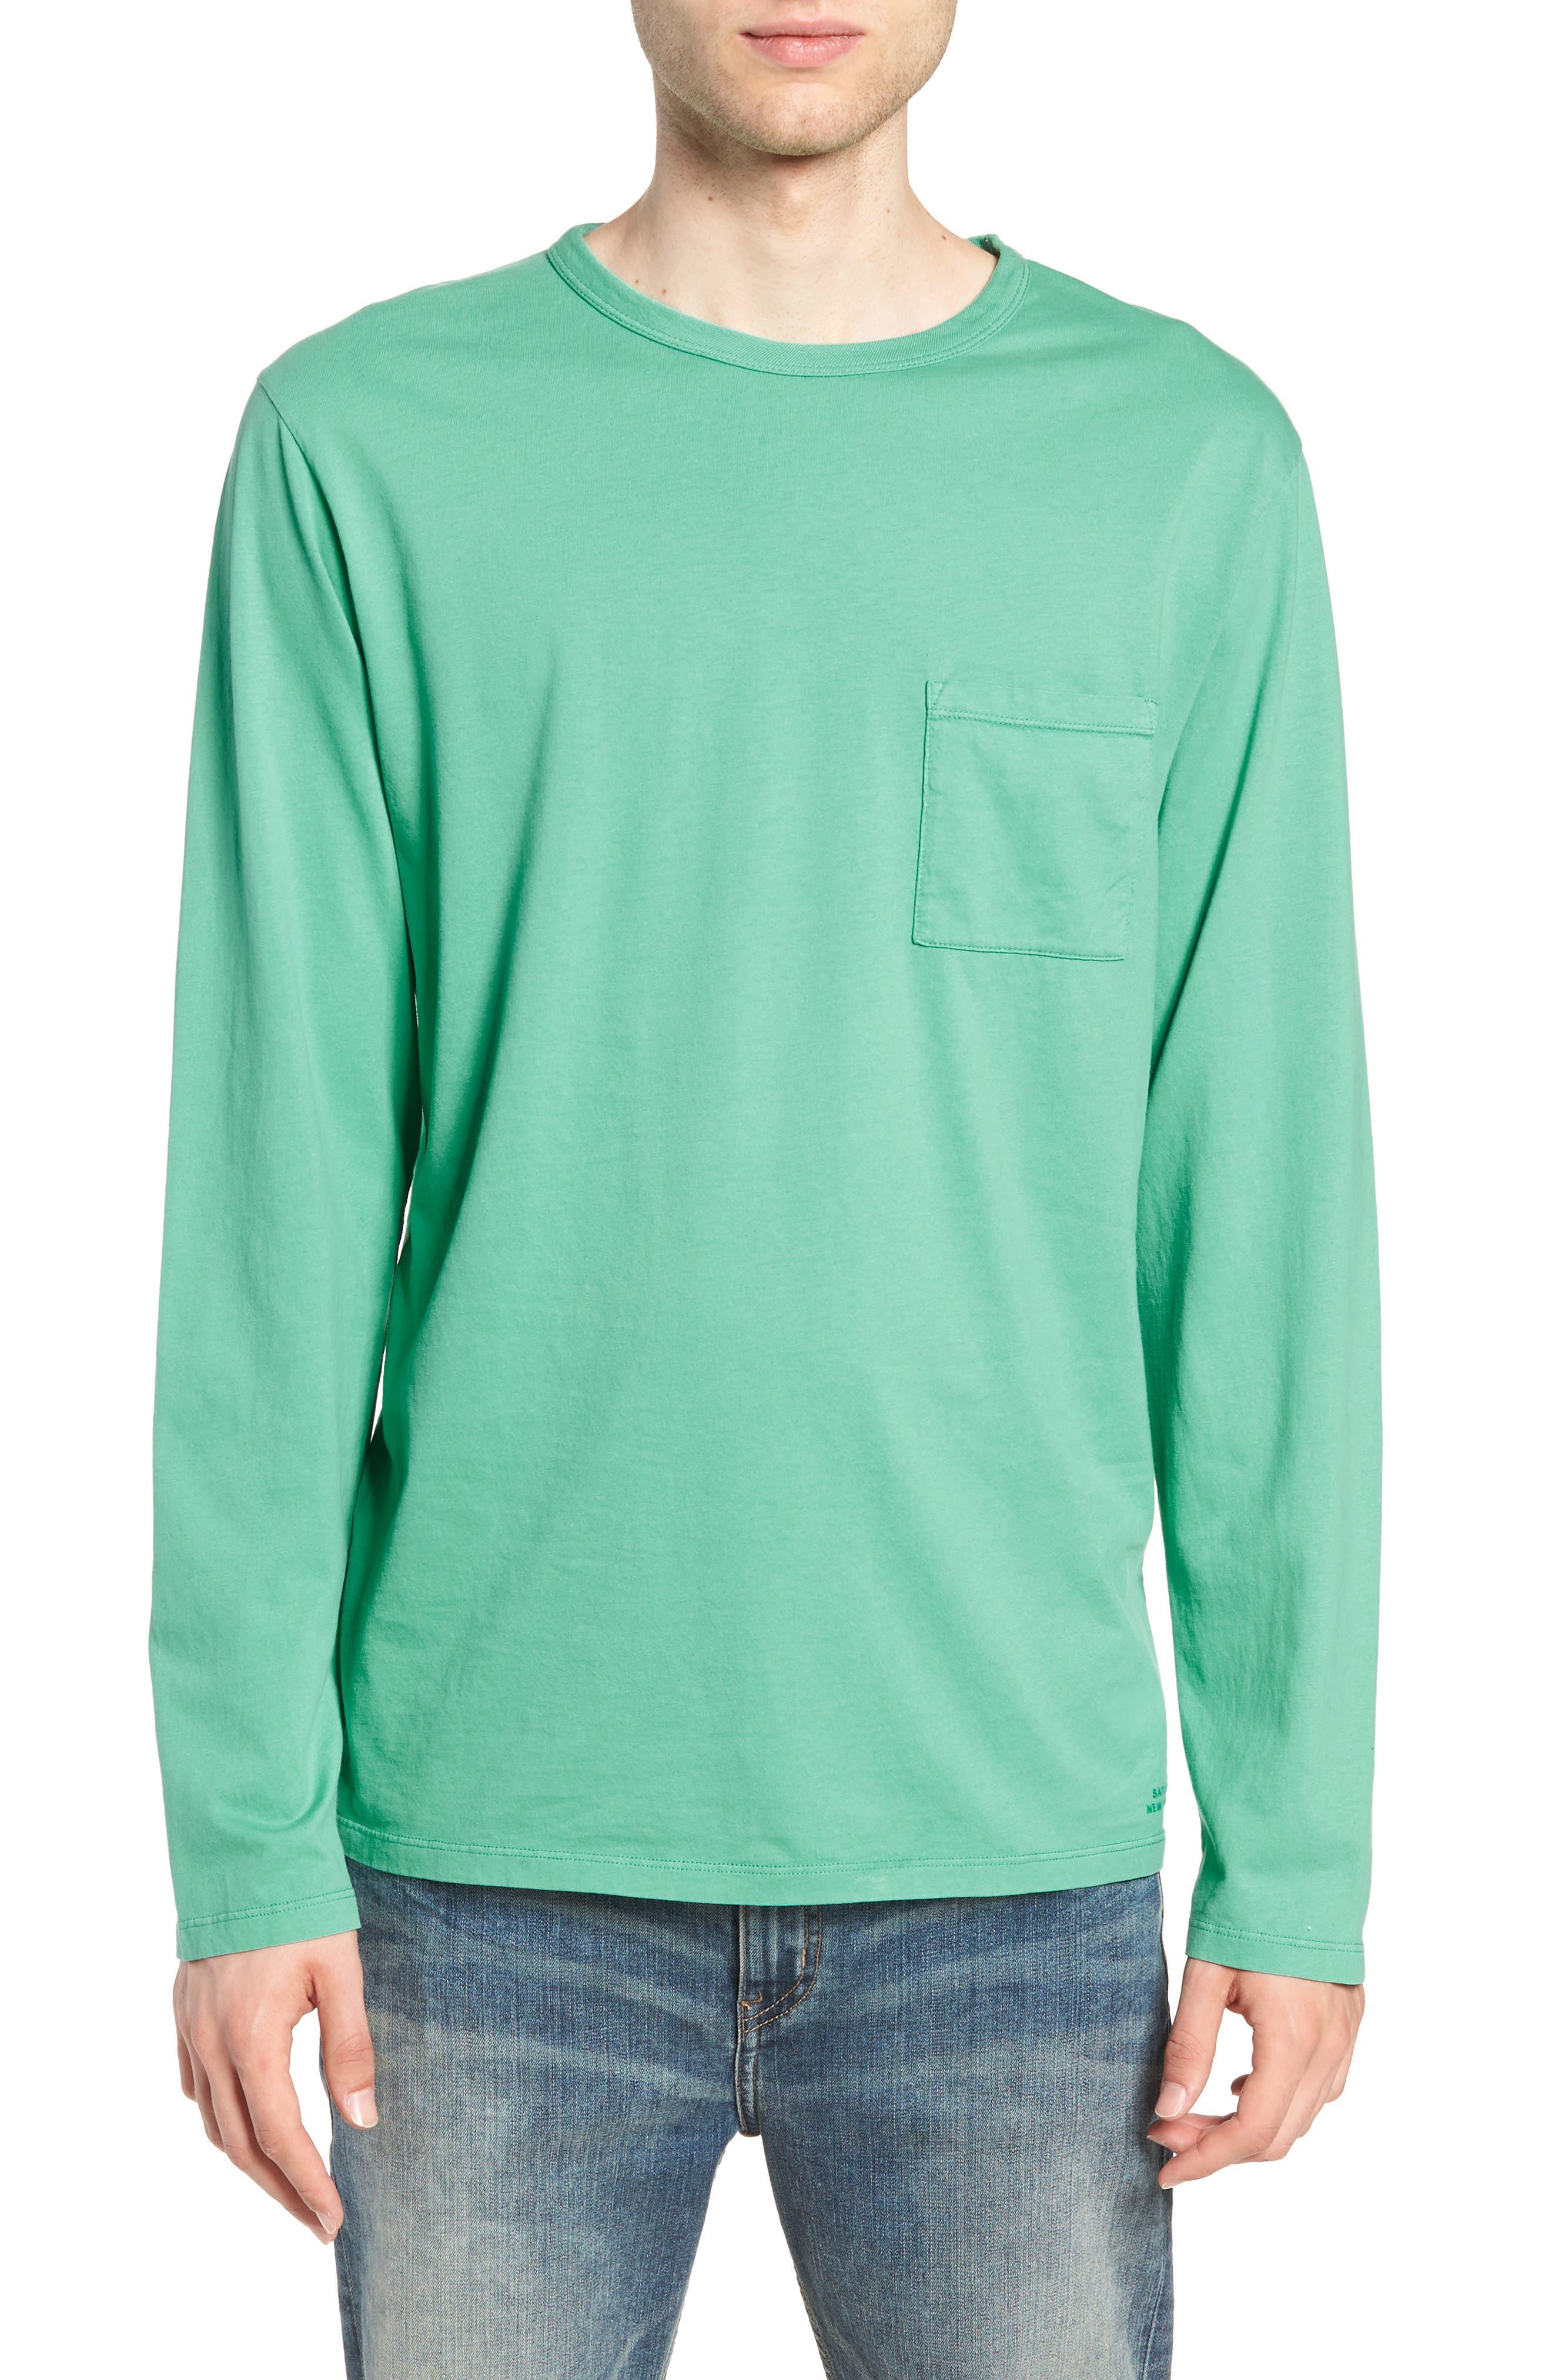 James Pima Long Sleeve Pocket T-Shirt,                             Main thumbnail 1, color,                             SEAFOAM GREEN